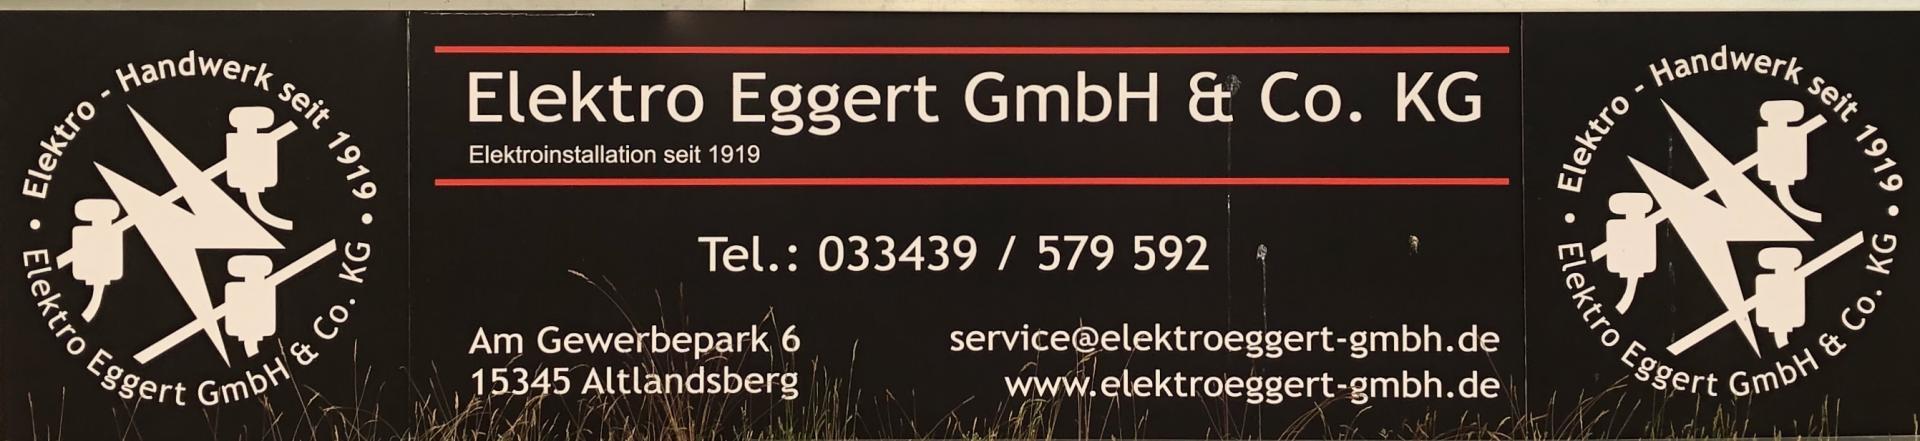 Elektro Eggert